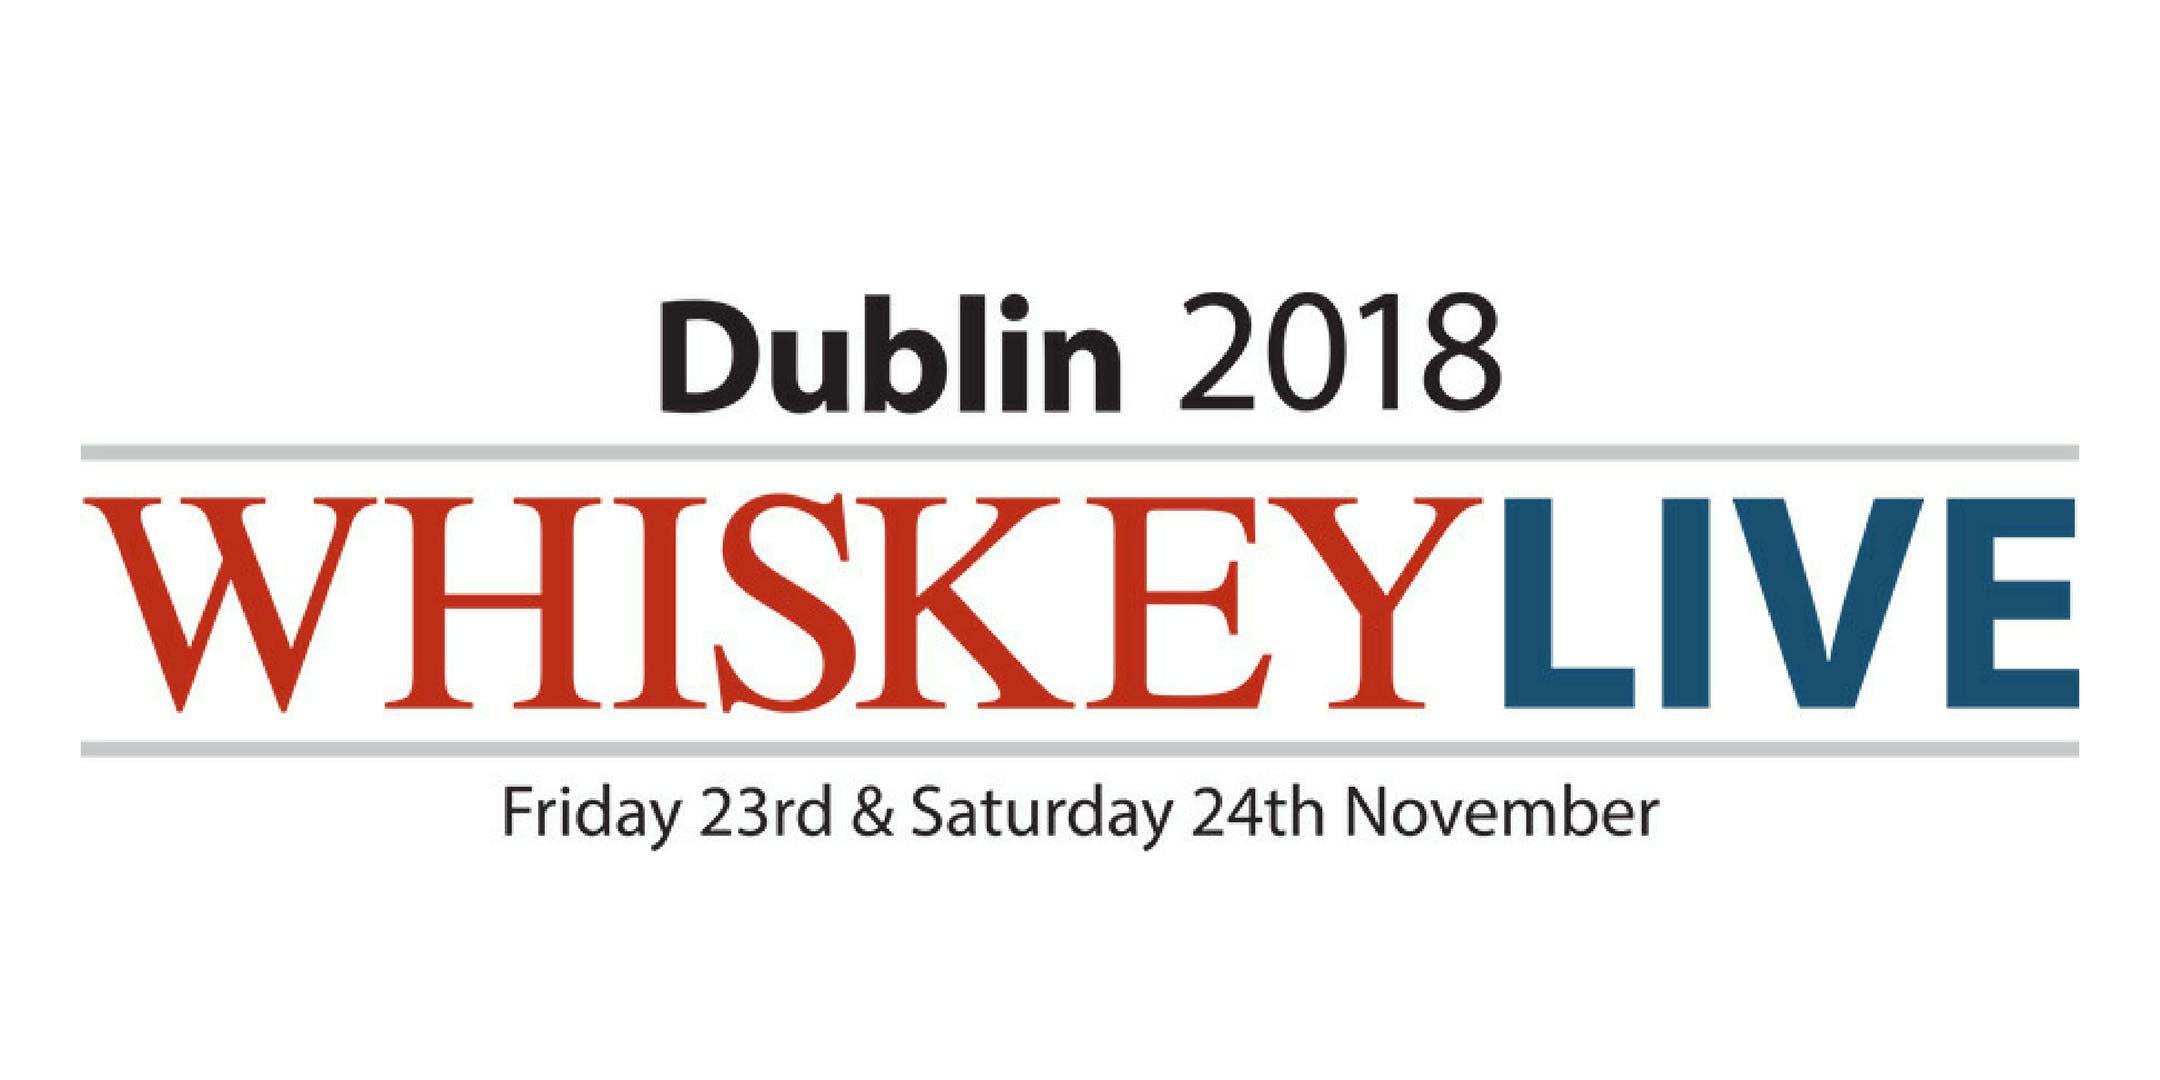 Whiskey Live Dublin 2018 - Saturday Session 1.00-4.30pm